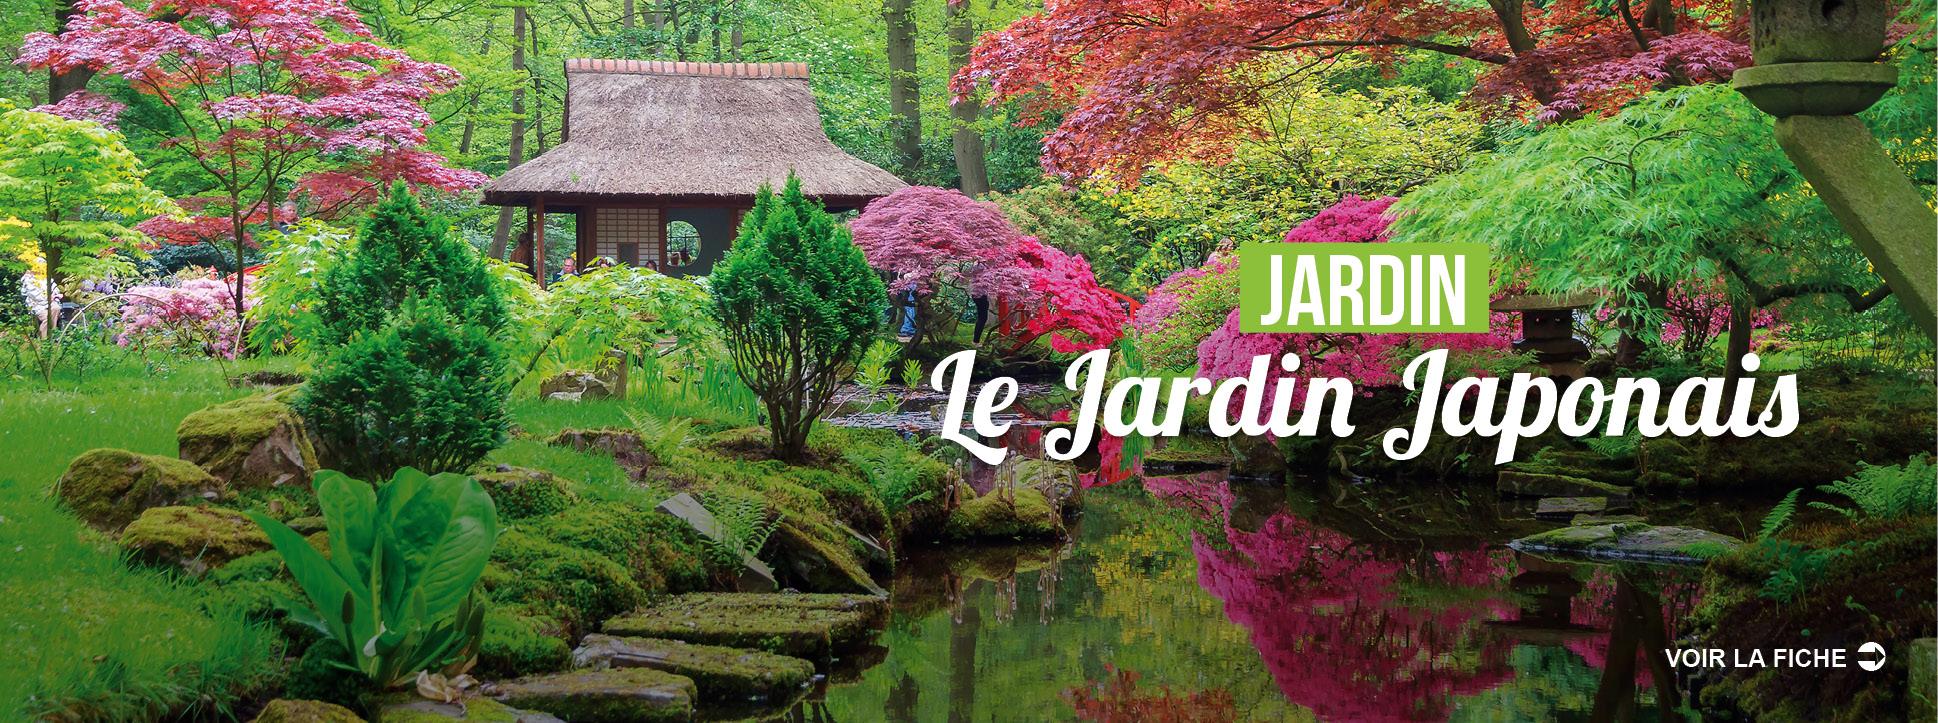 SLIDE-jardin-japonais